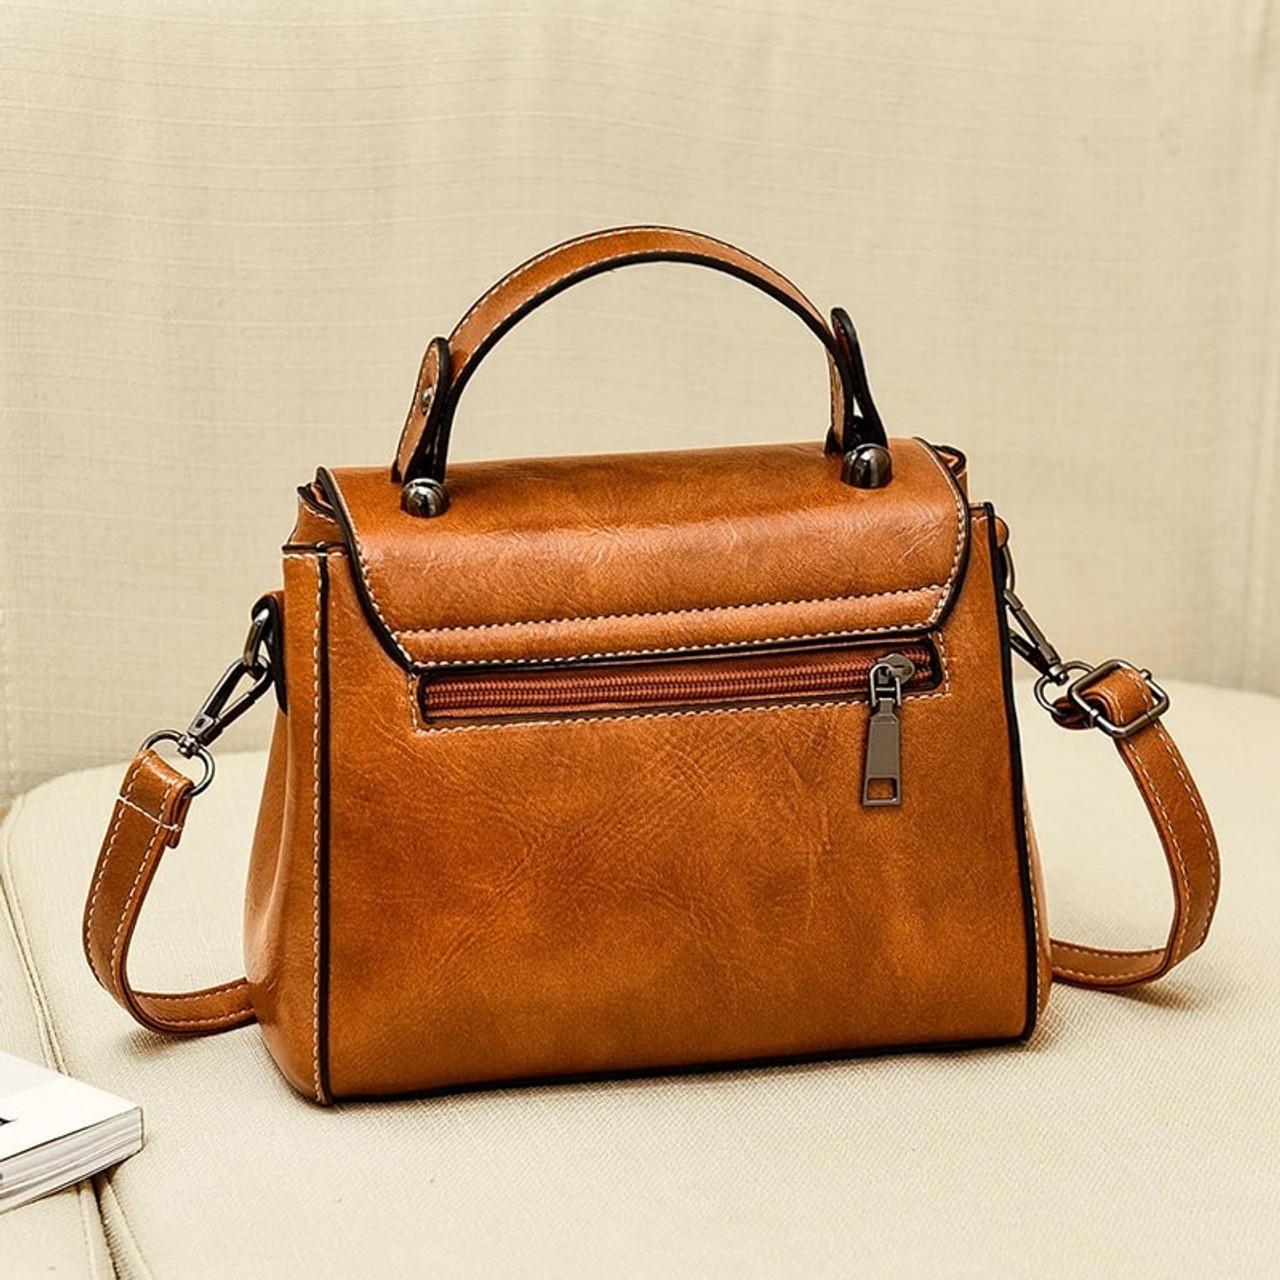 8e0035d9c5ca 2019 Spring Real Genuine Leather Handbag Handbags Woman Small Vintage  Crossbody Bags For Women Shoulder Messenger Bag Female